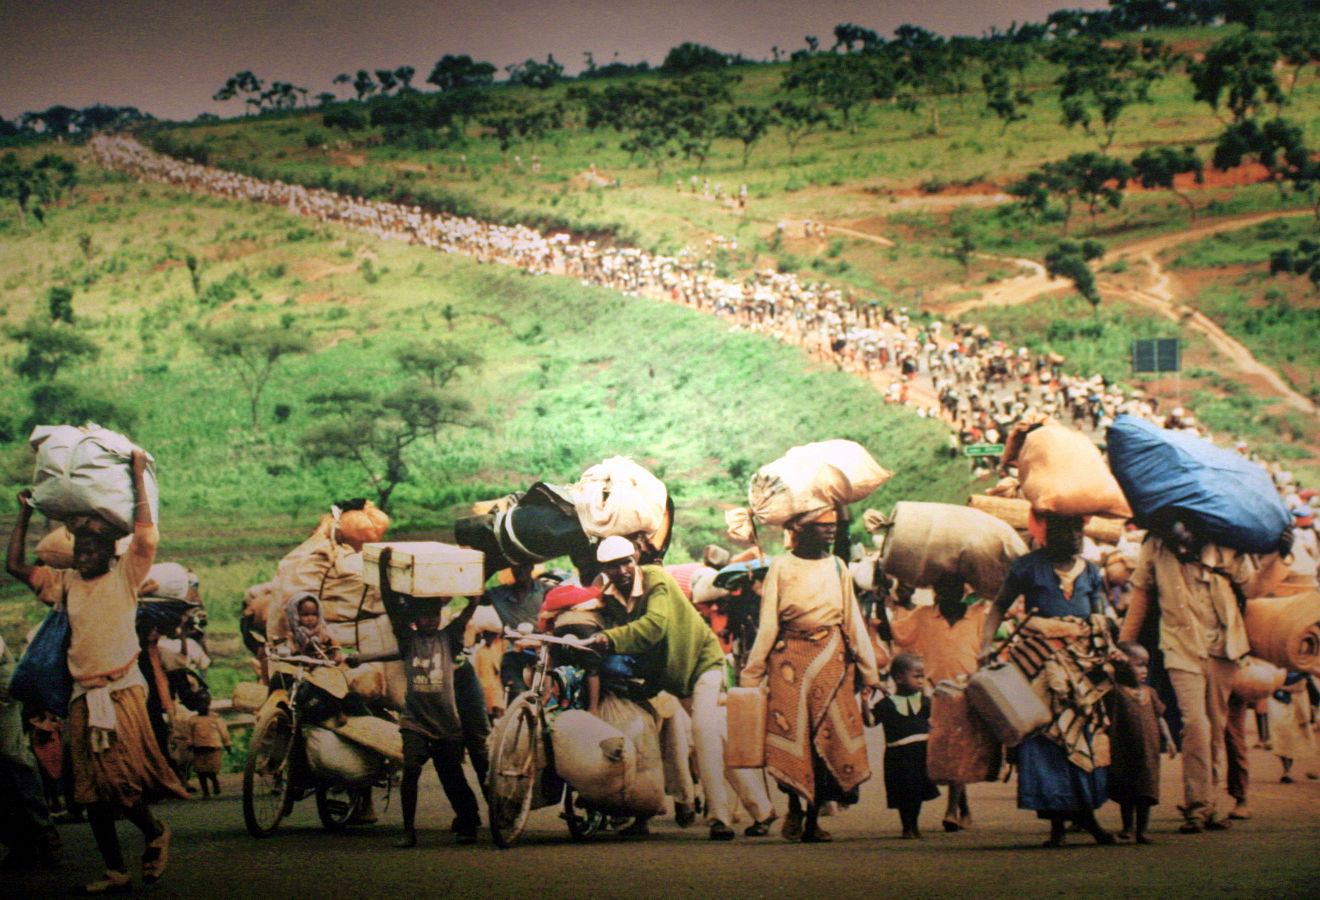 Rwanda refugee crisis after the Rwandan Genocide